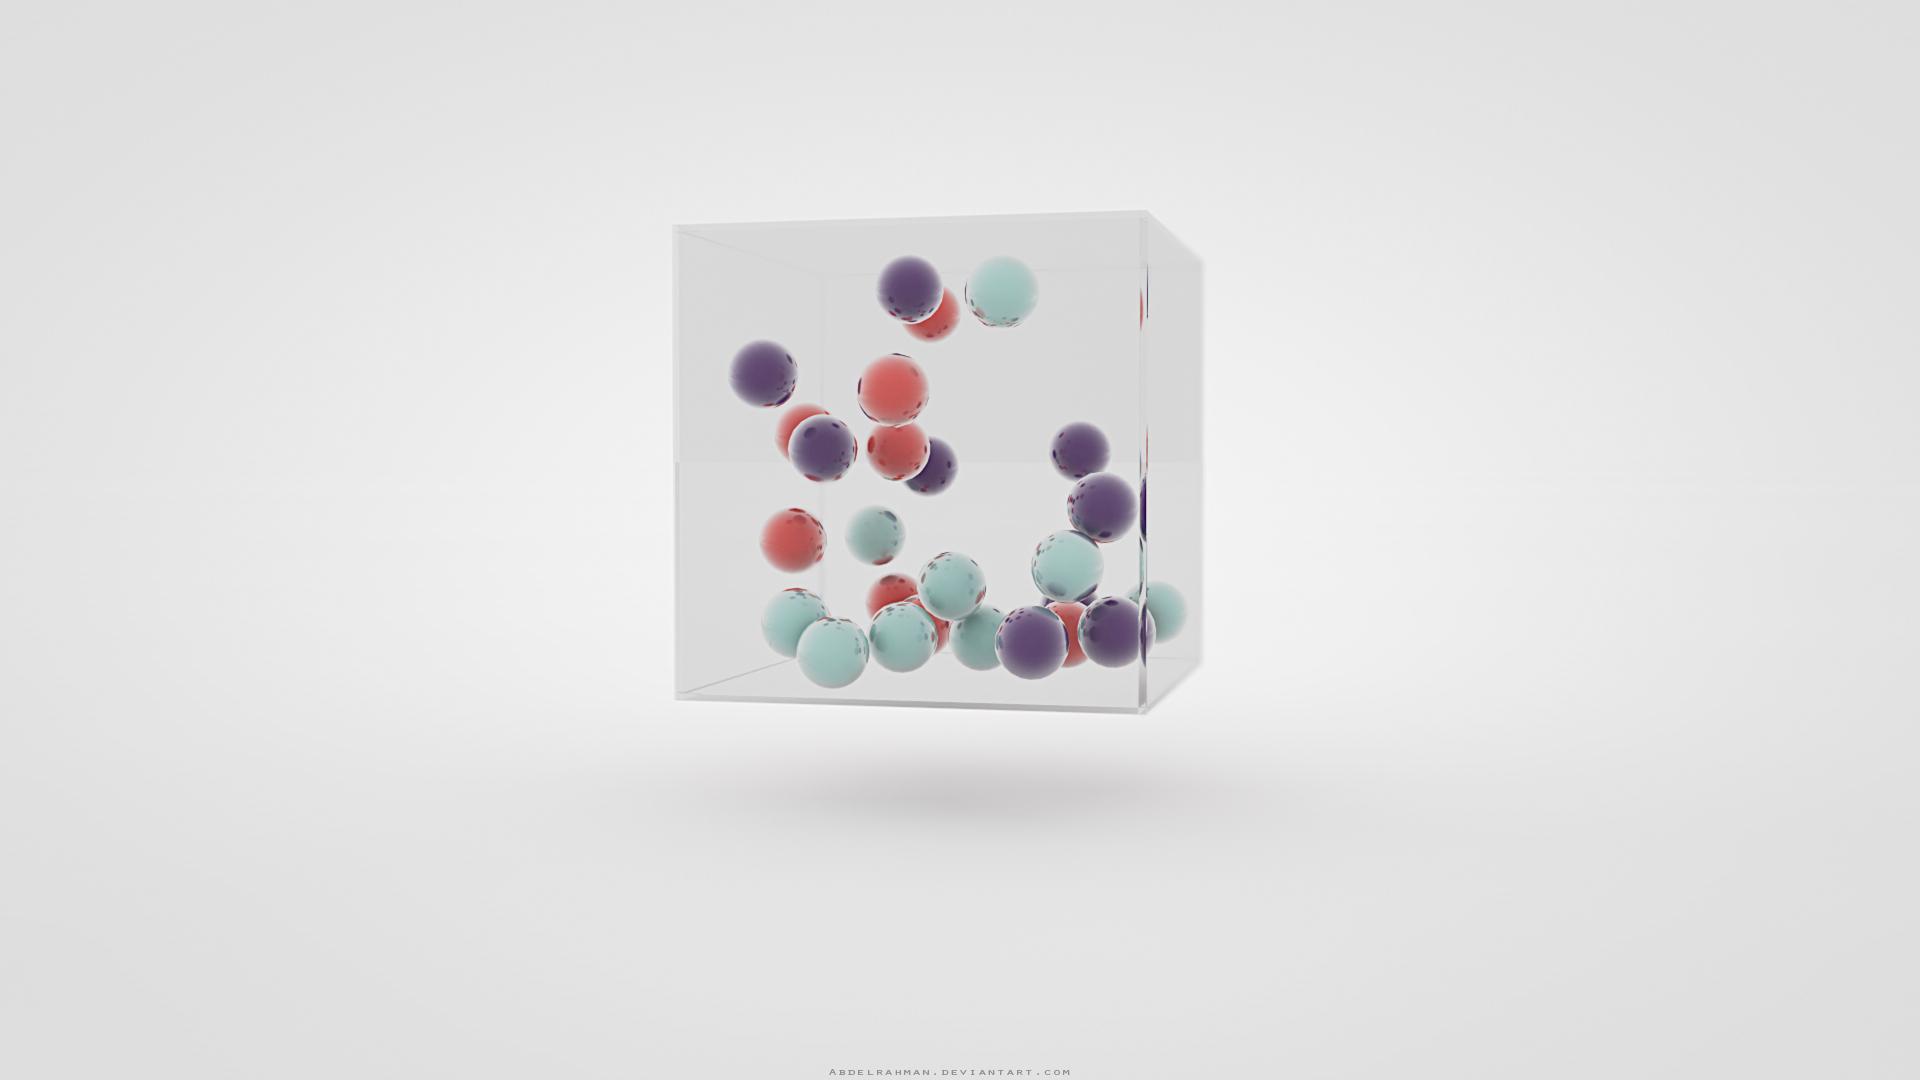 dancing marbles by abdelrahman